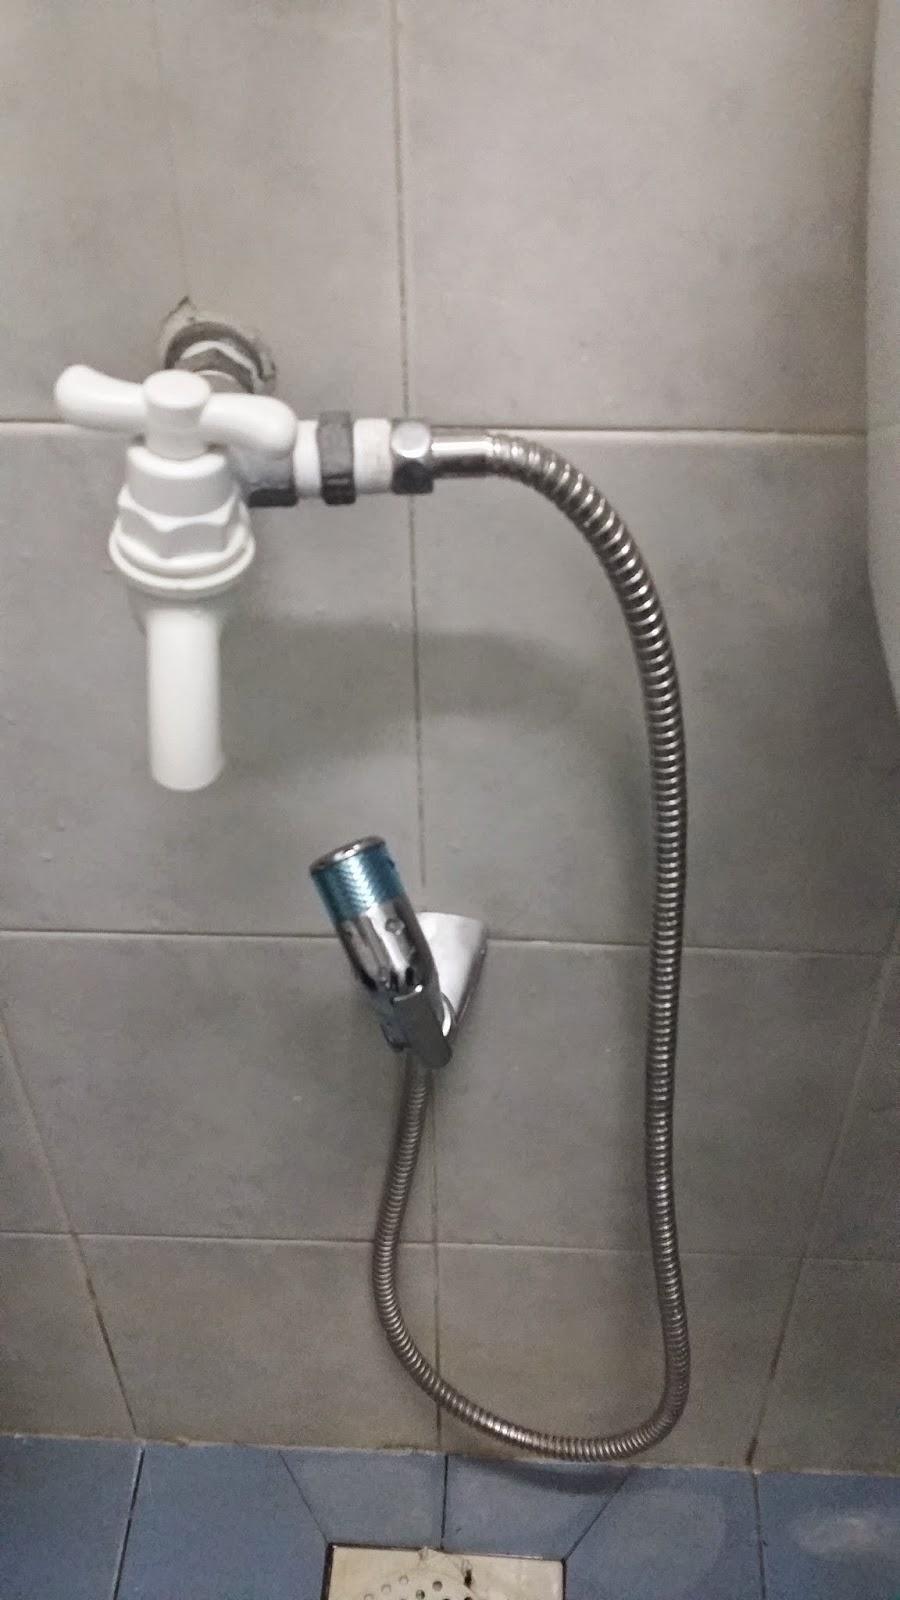 Tulah Akibatnya Bila Ada Tetamu Yg Guna Handspray Untuk Mandi Dan Cuci Lantai Grrrr Nak Gunalah Shower Pasang Je La Tu